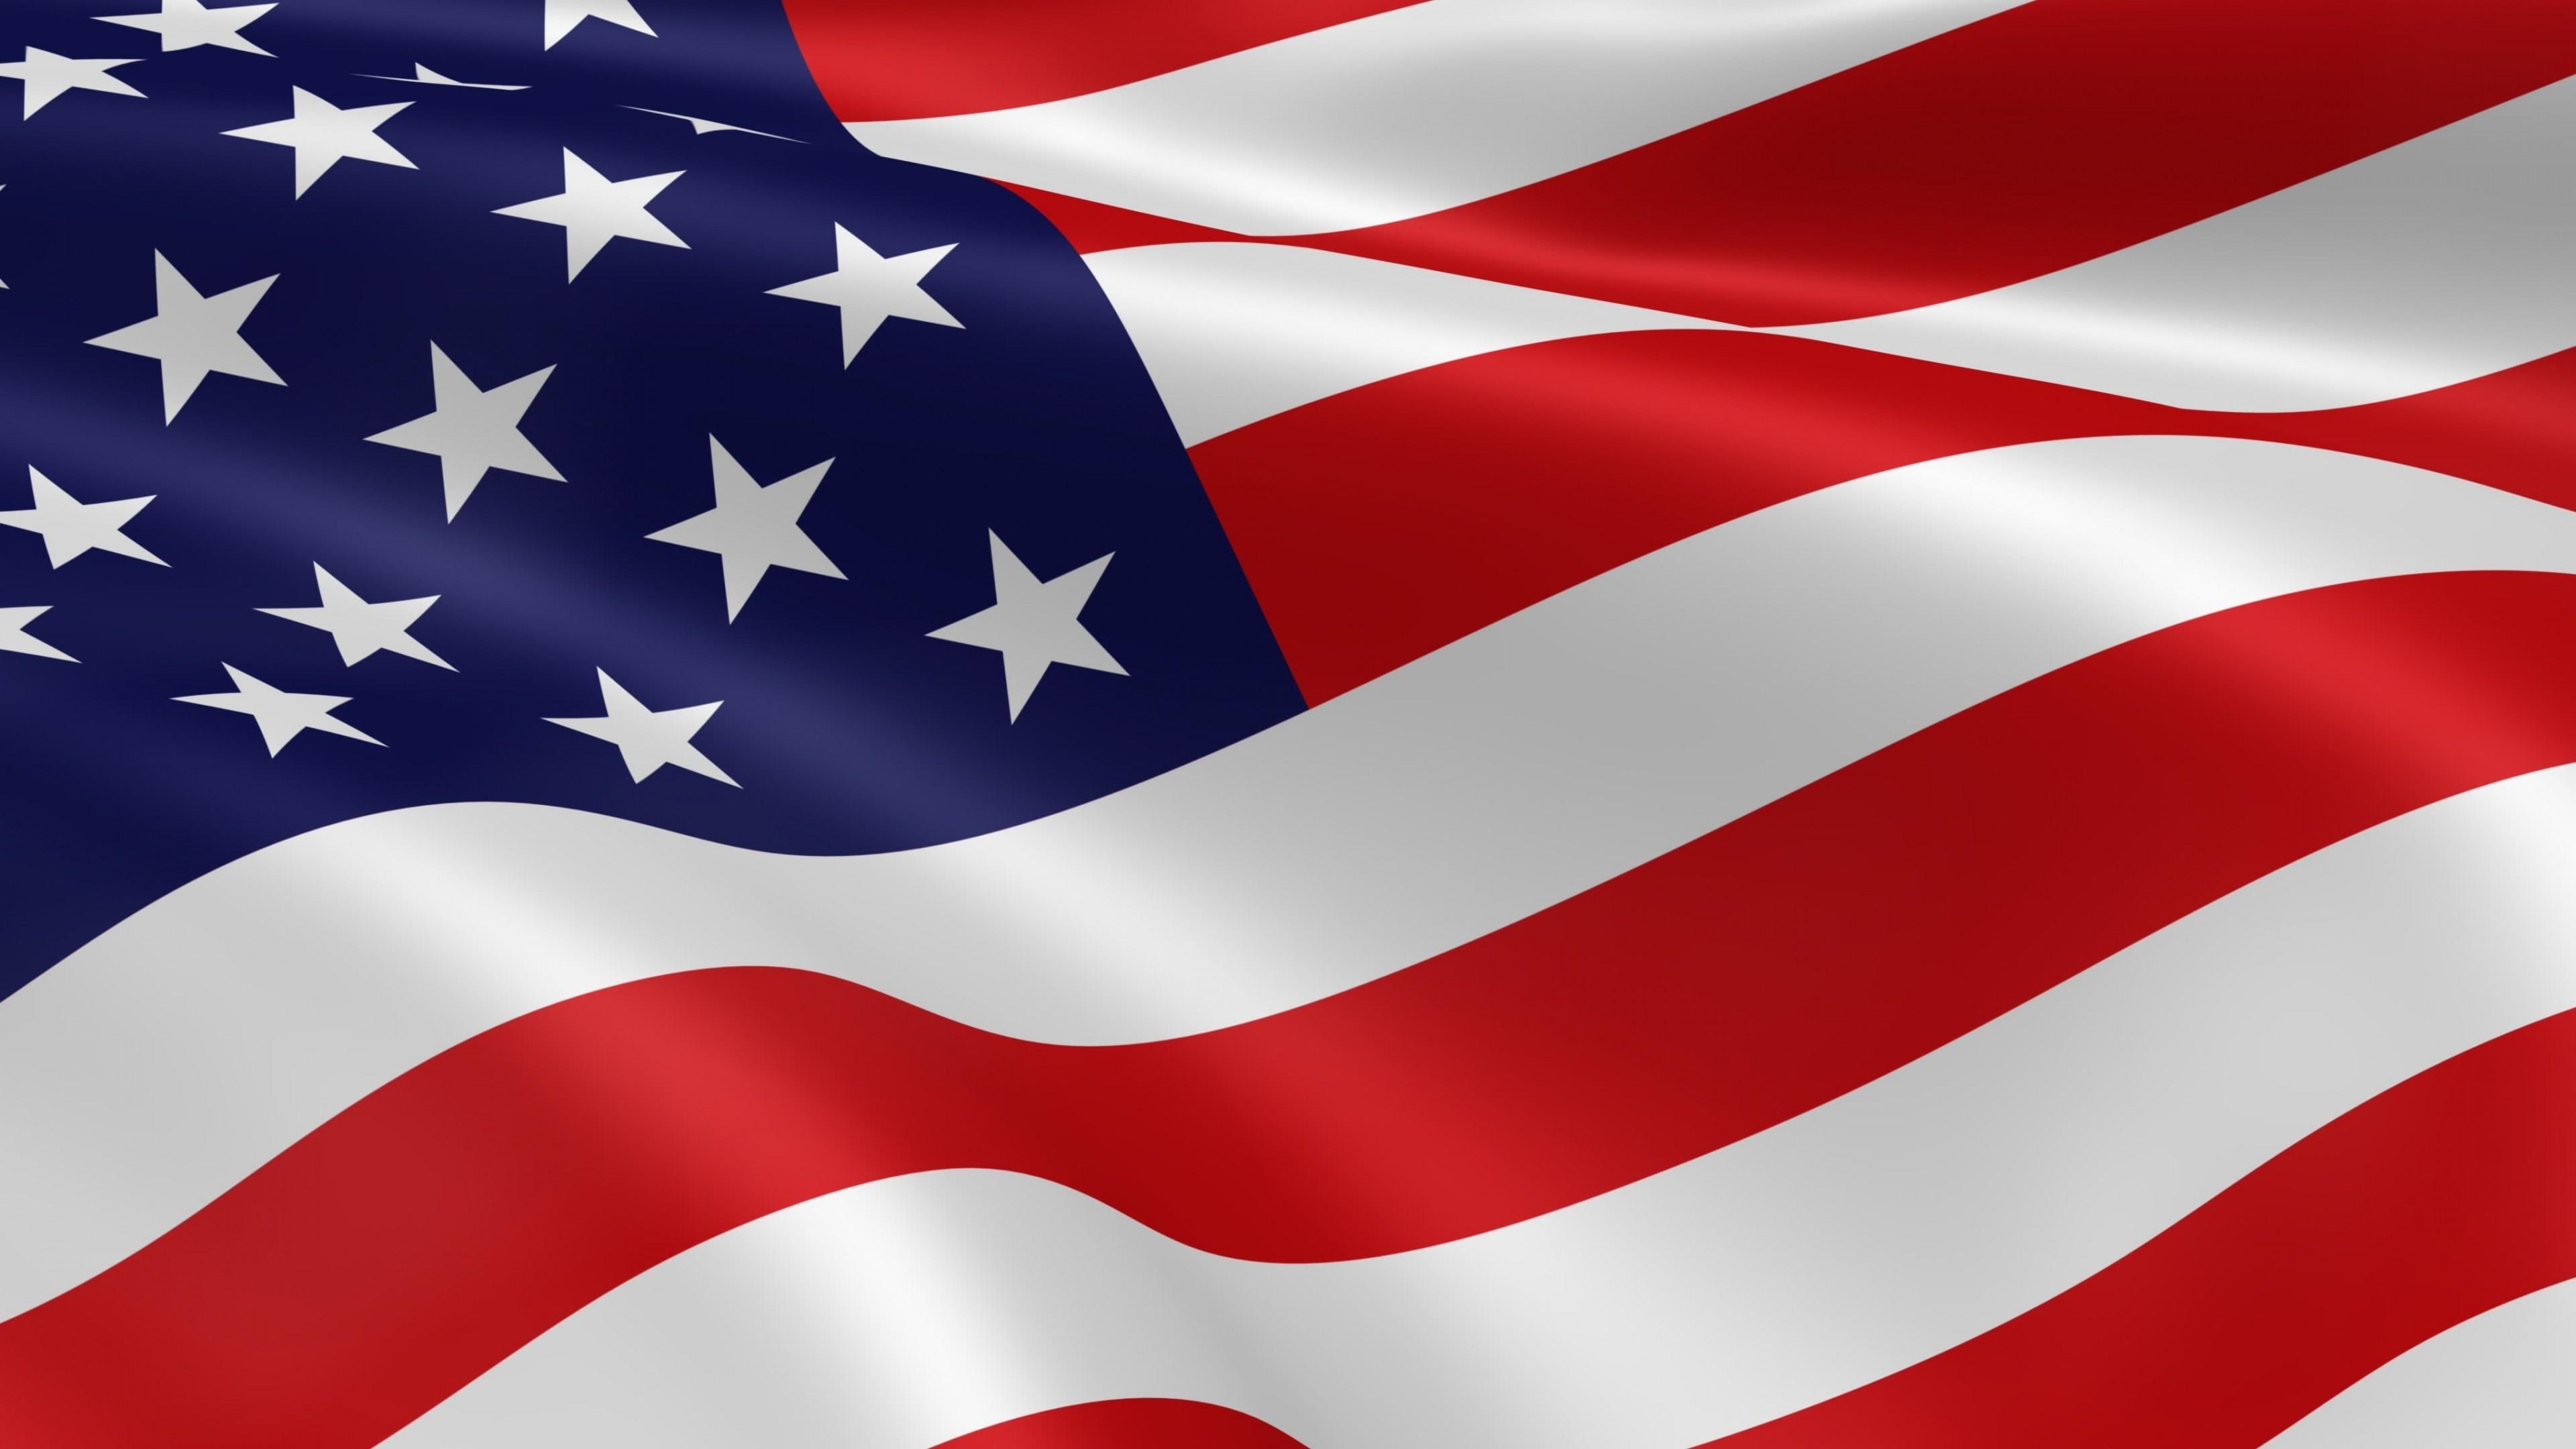 wallpaper usa flag, hd, 4k, world, #3330